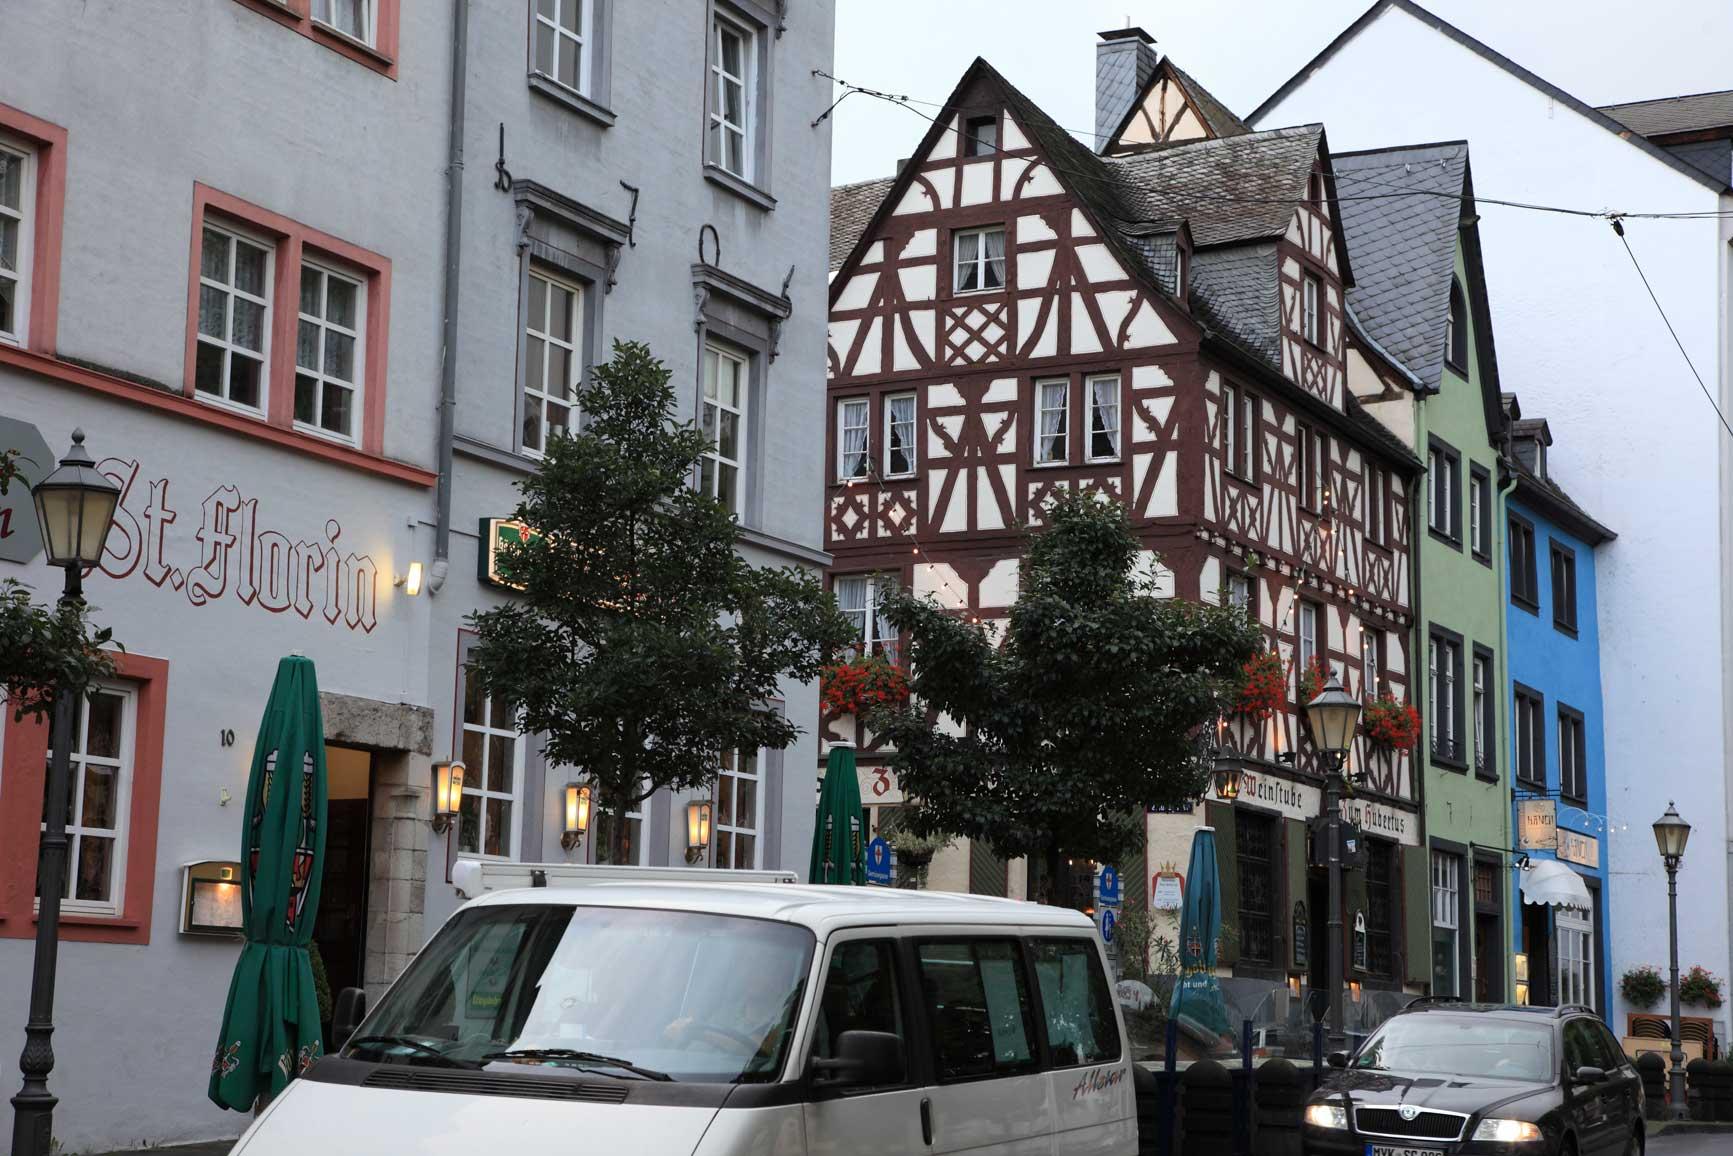 Rhine-15-08-14_21-16-17